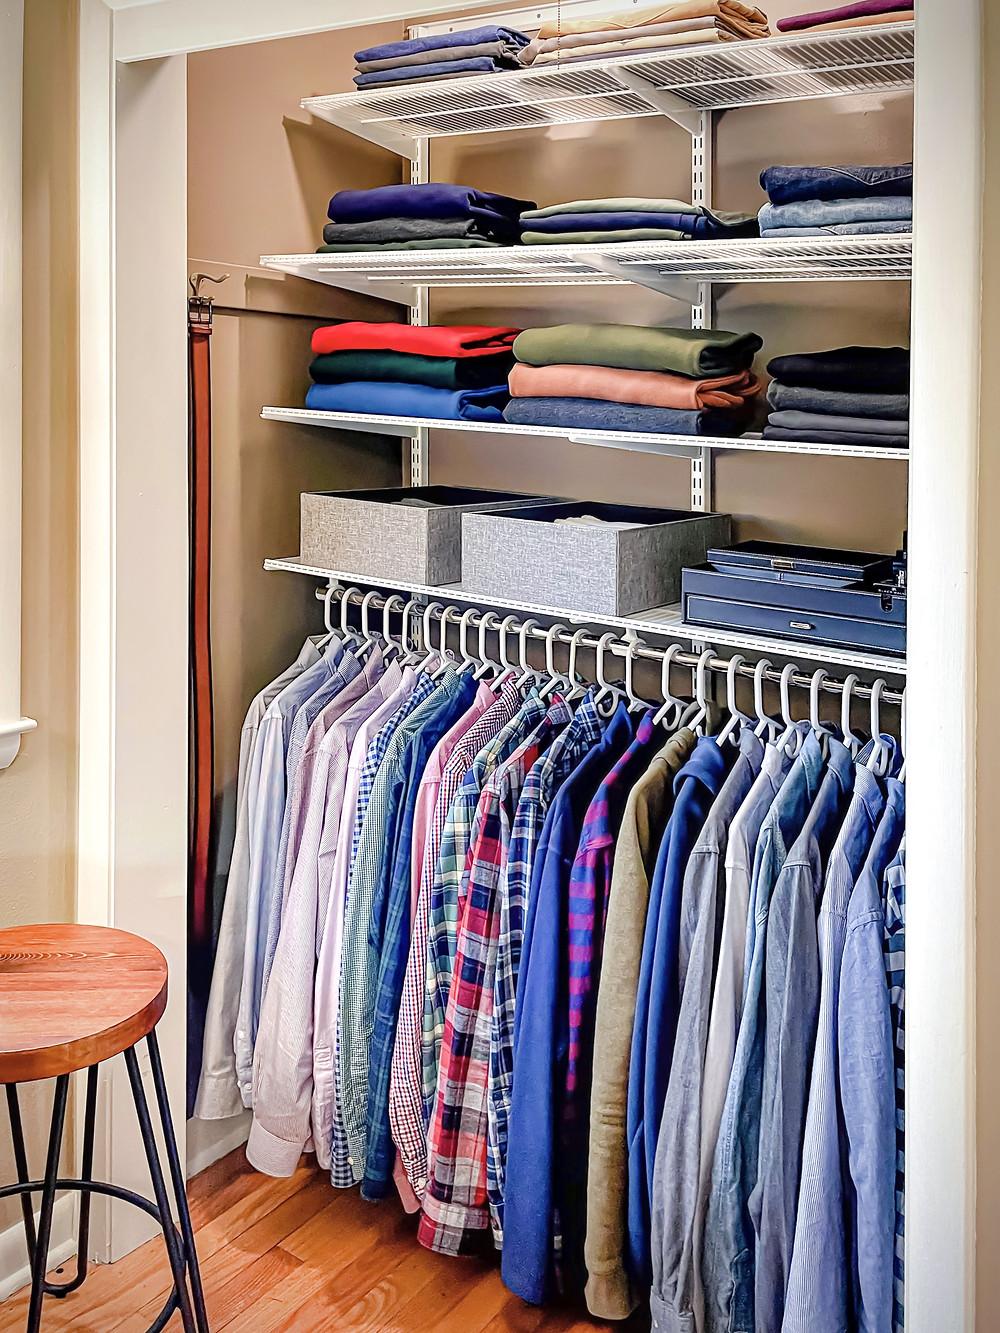 men's clothing reach-in closet using the elfa system